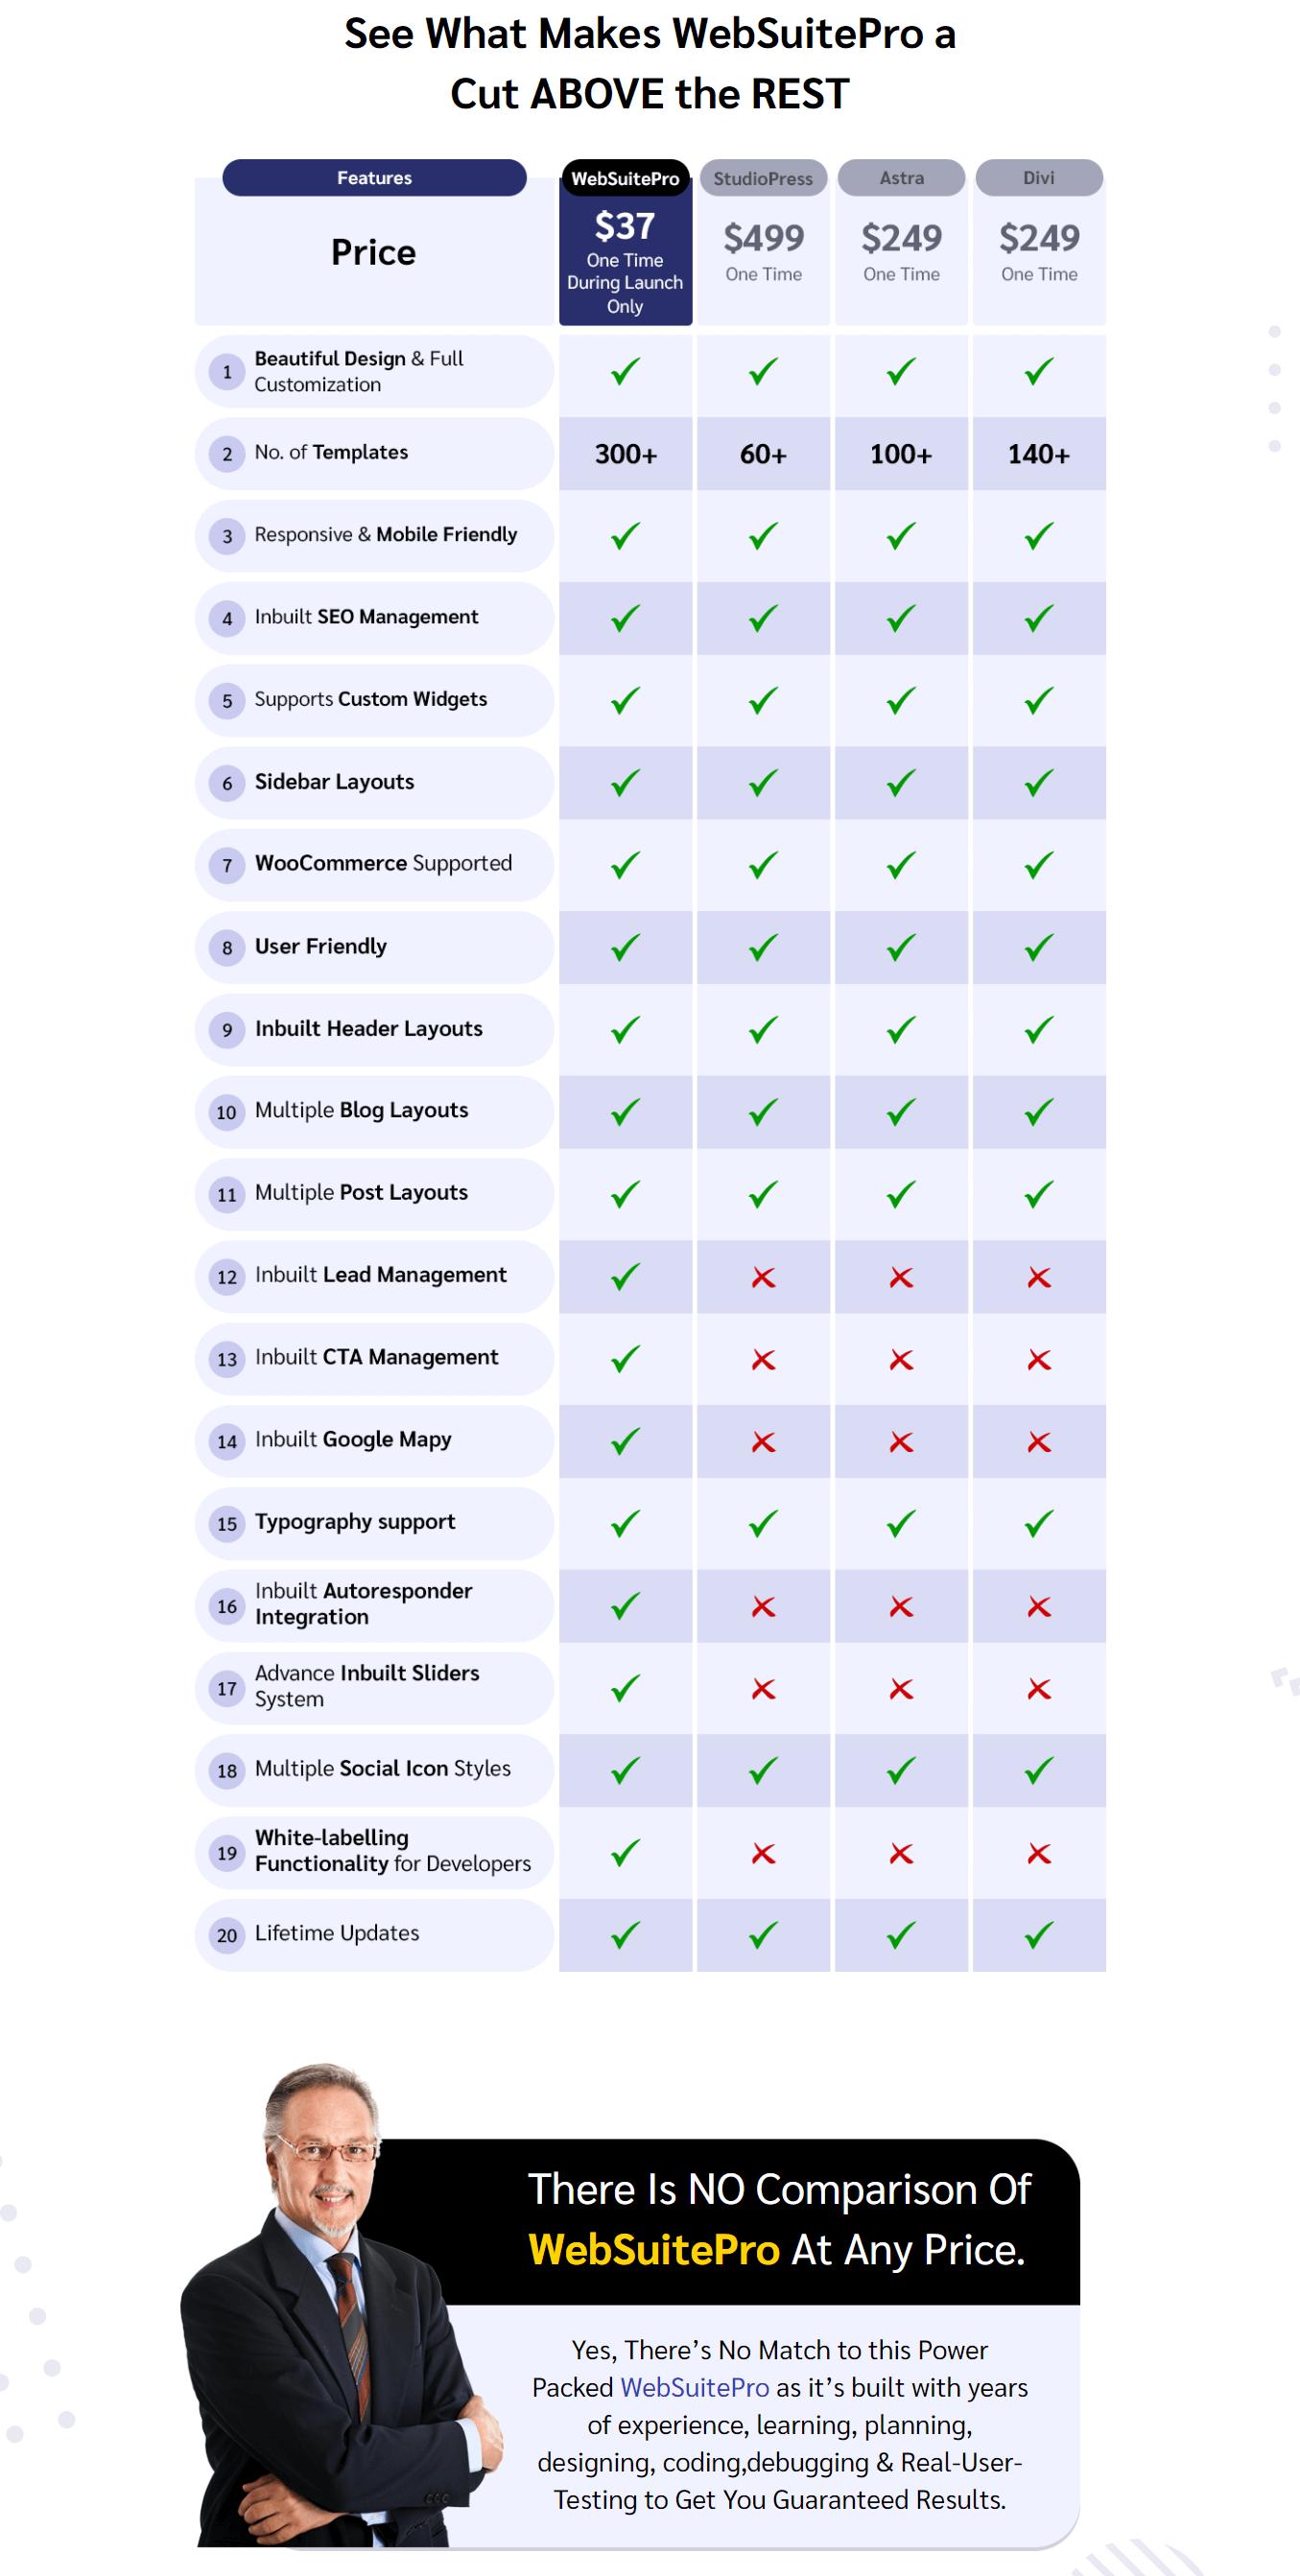 WebSuitePro-Comparison